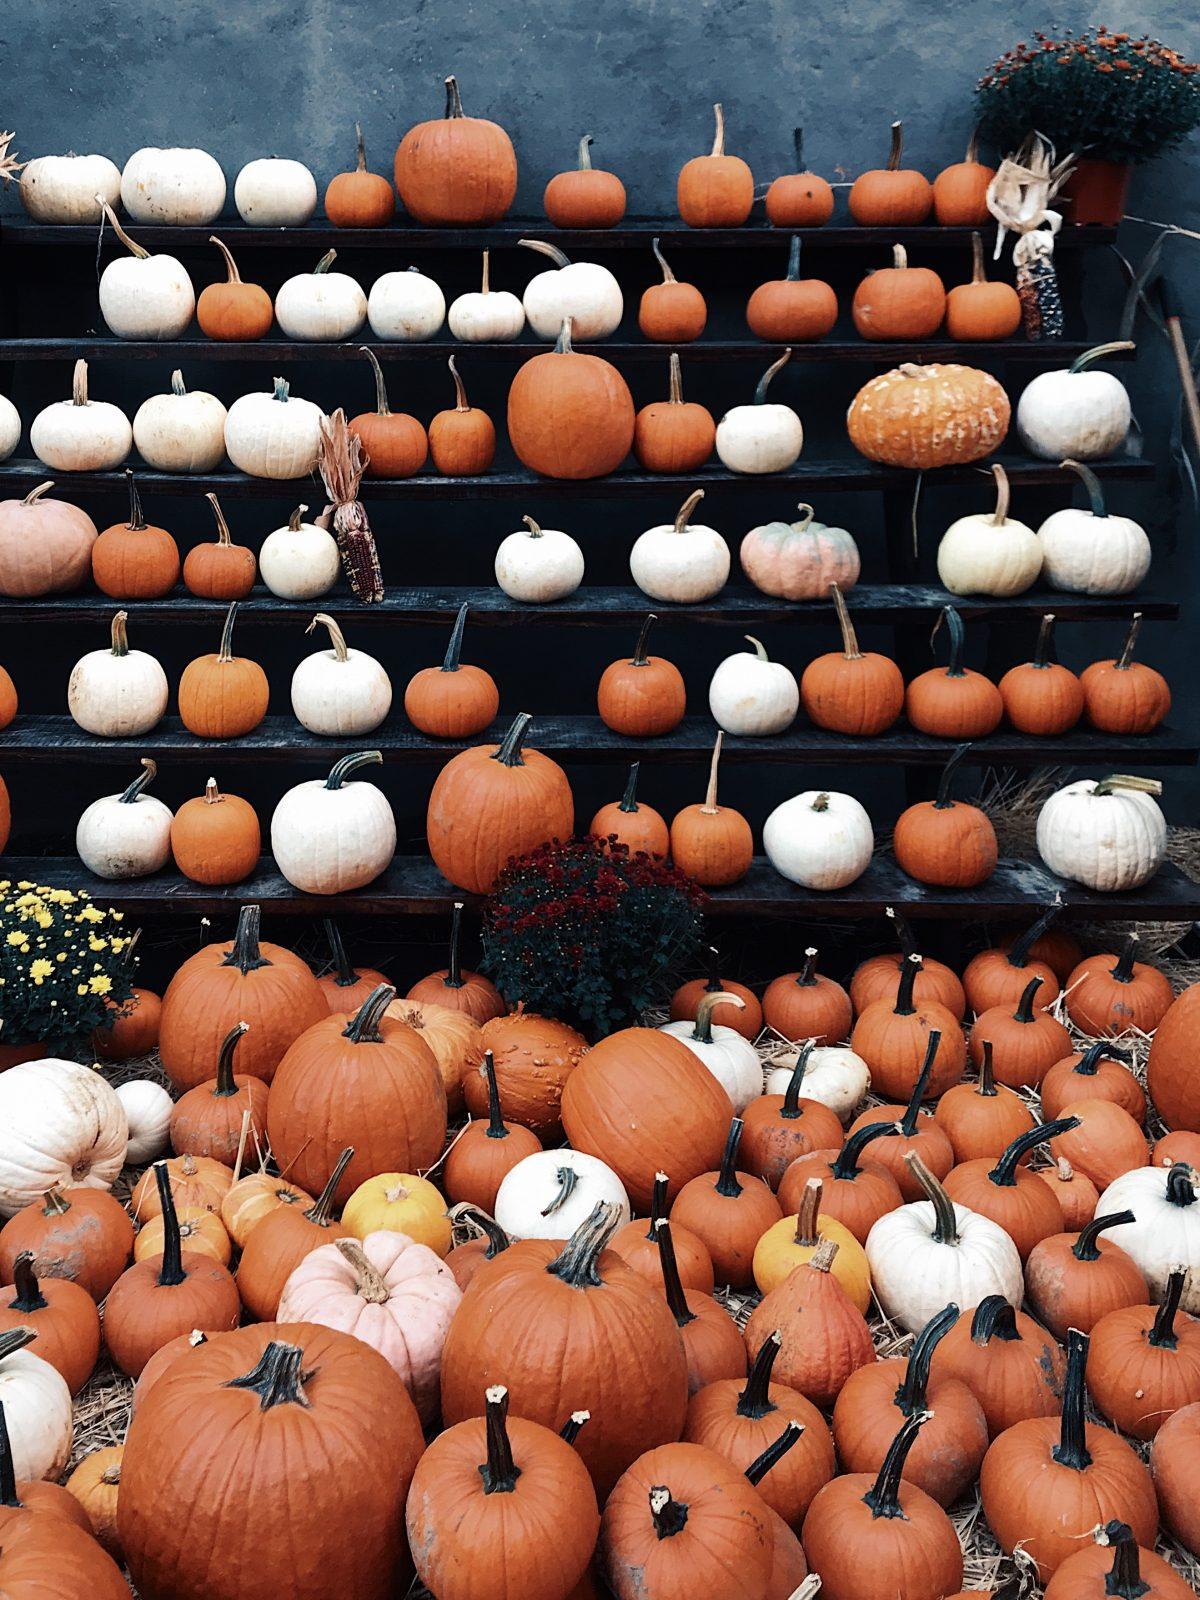 How to Recycle Halloween Pumpkins